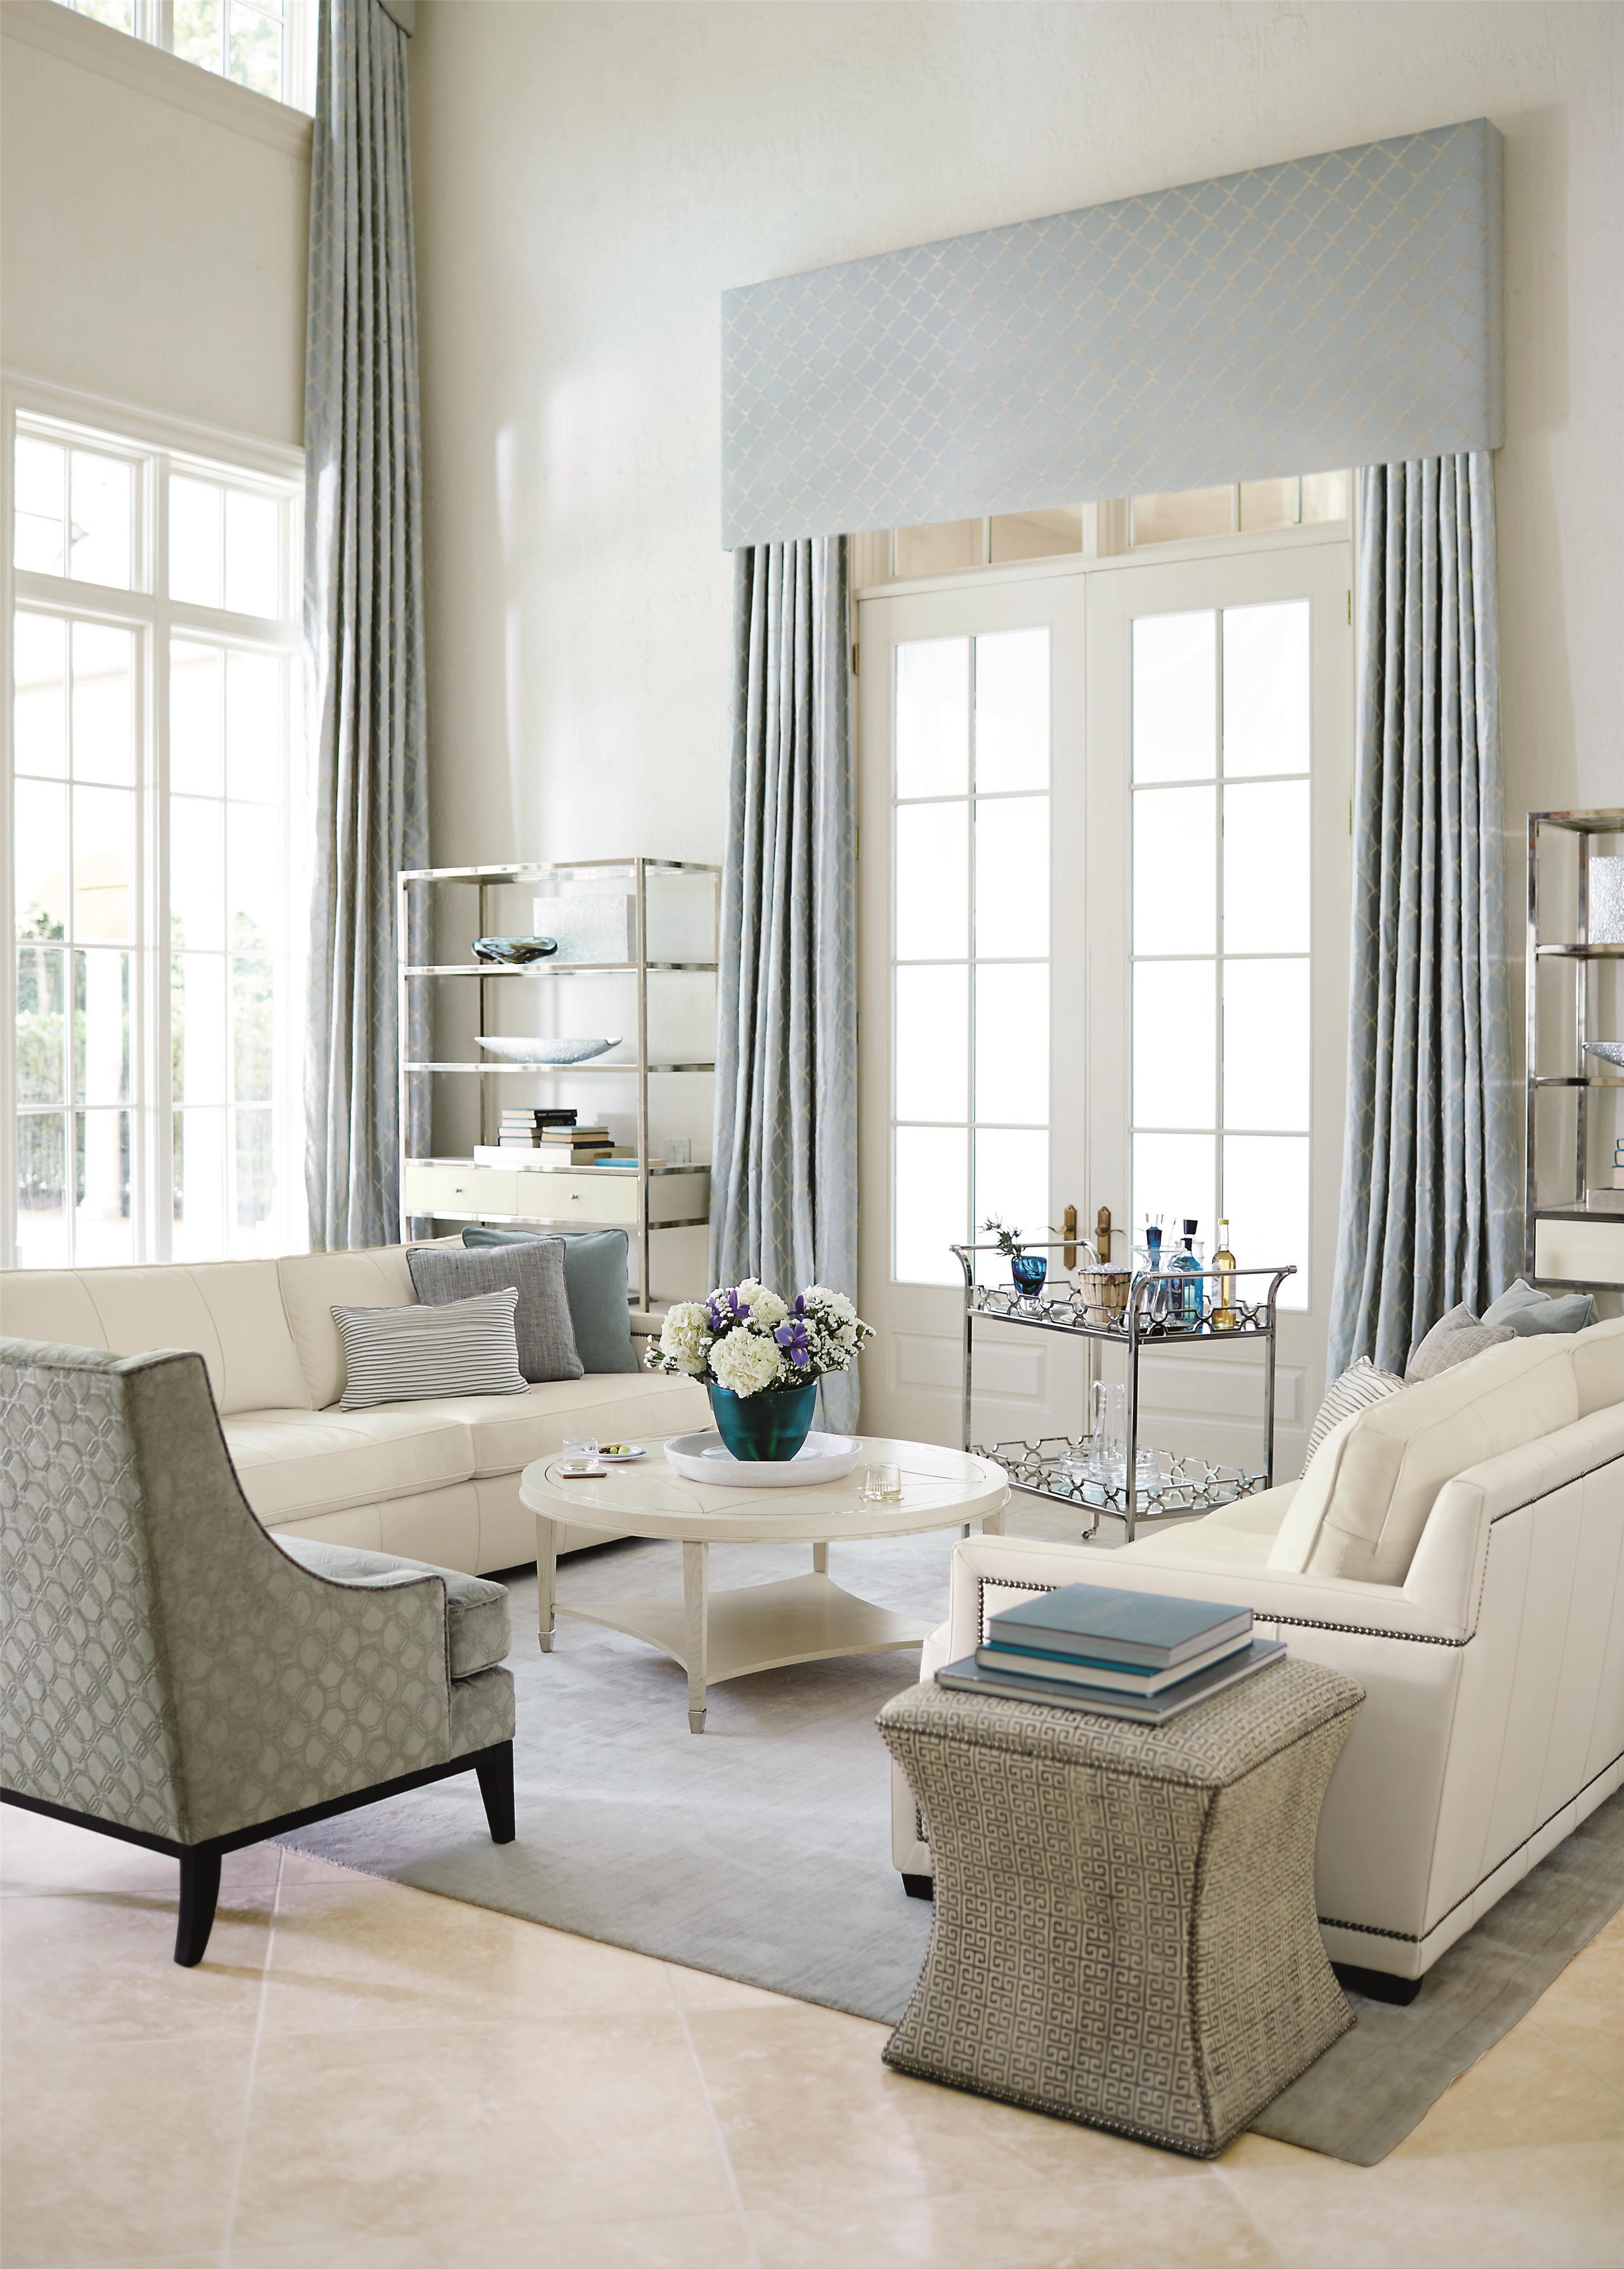 bernhardt living room furniture. Bernhardt Criteria 9 Piece Dining Set with Splat Back Chairs  Wayside Furniture 7 or more Sets